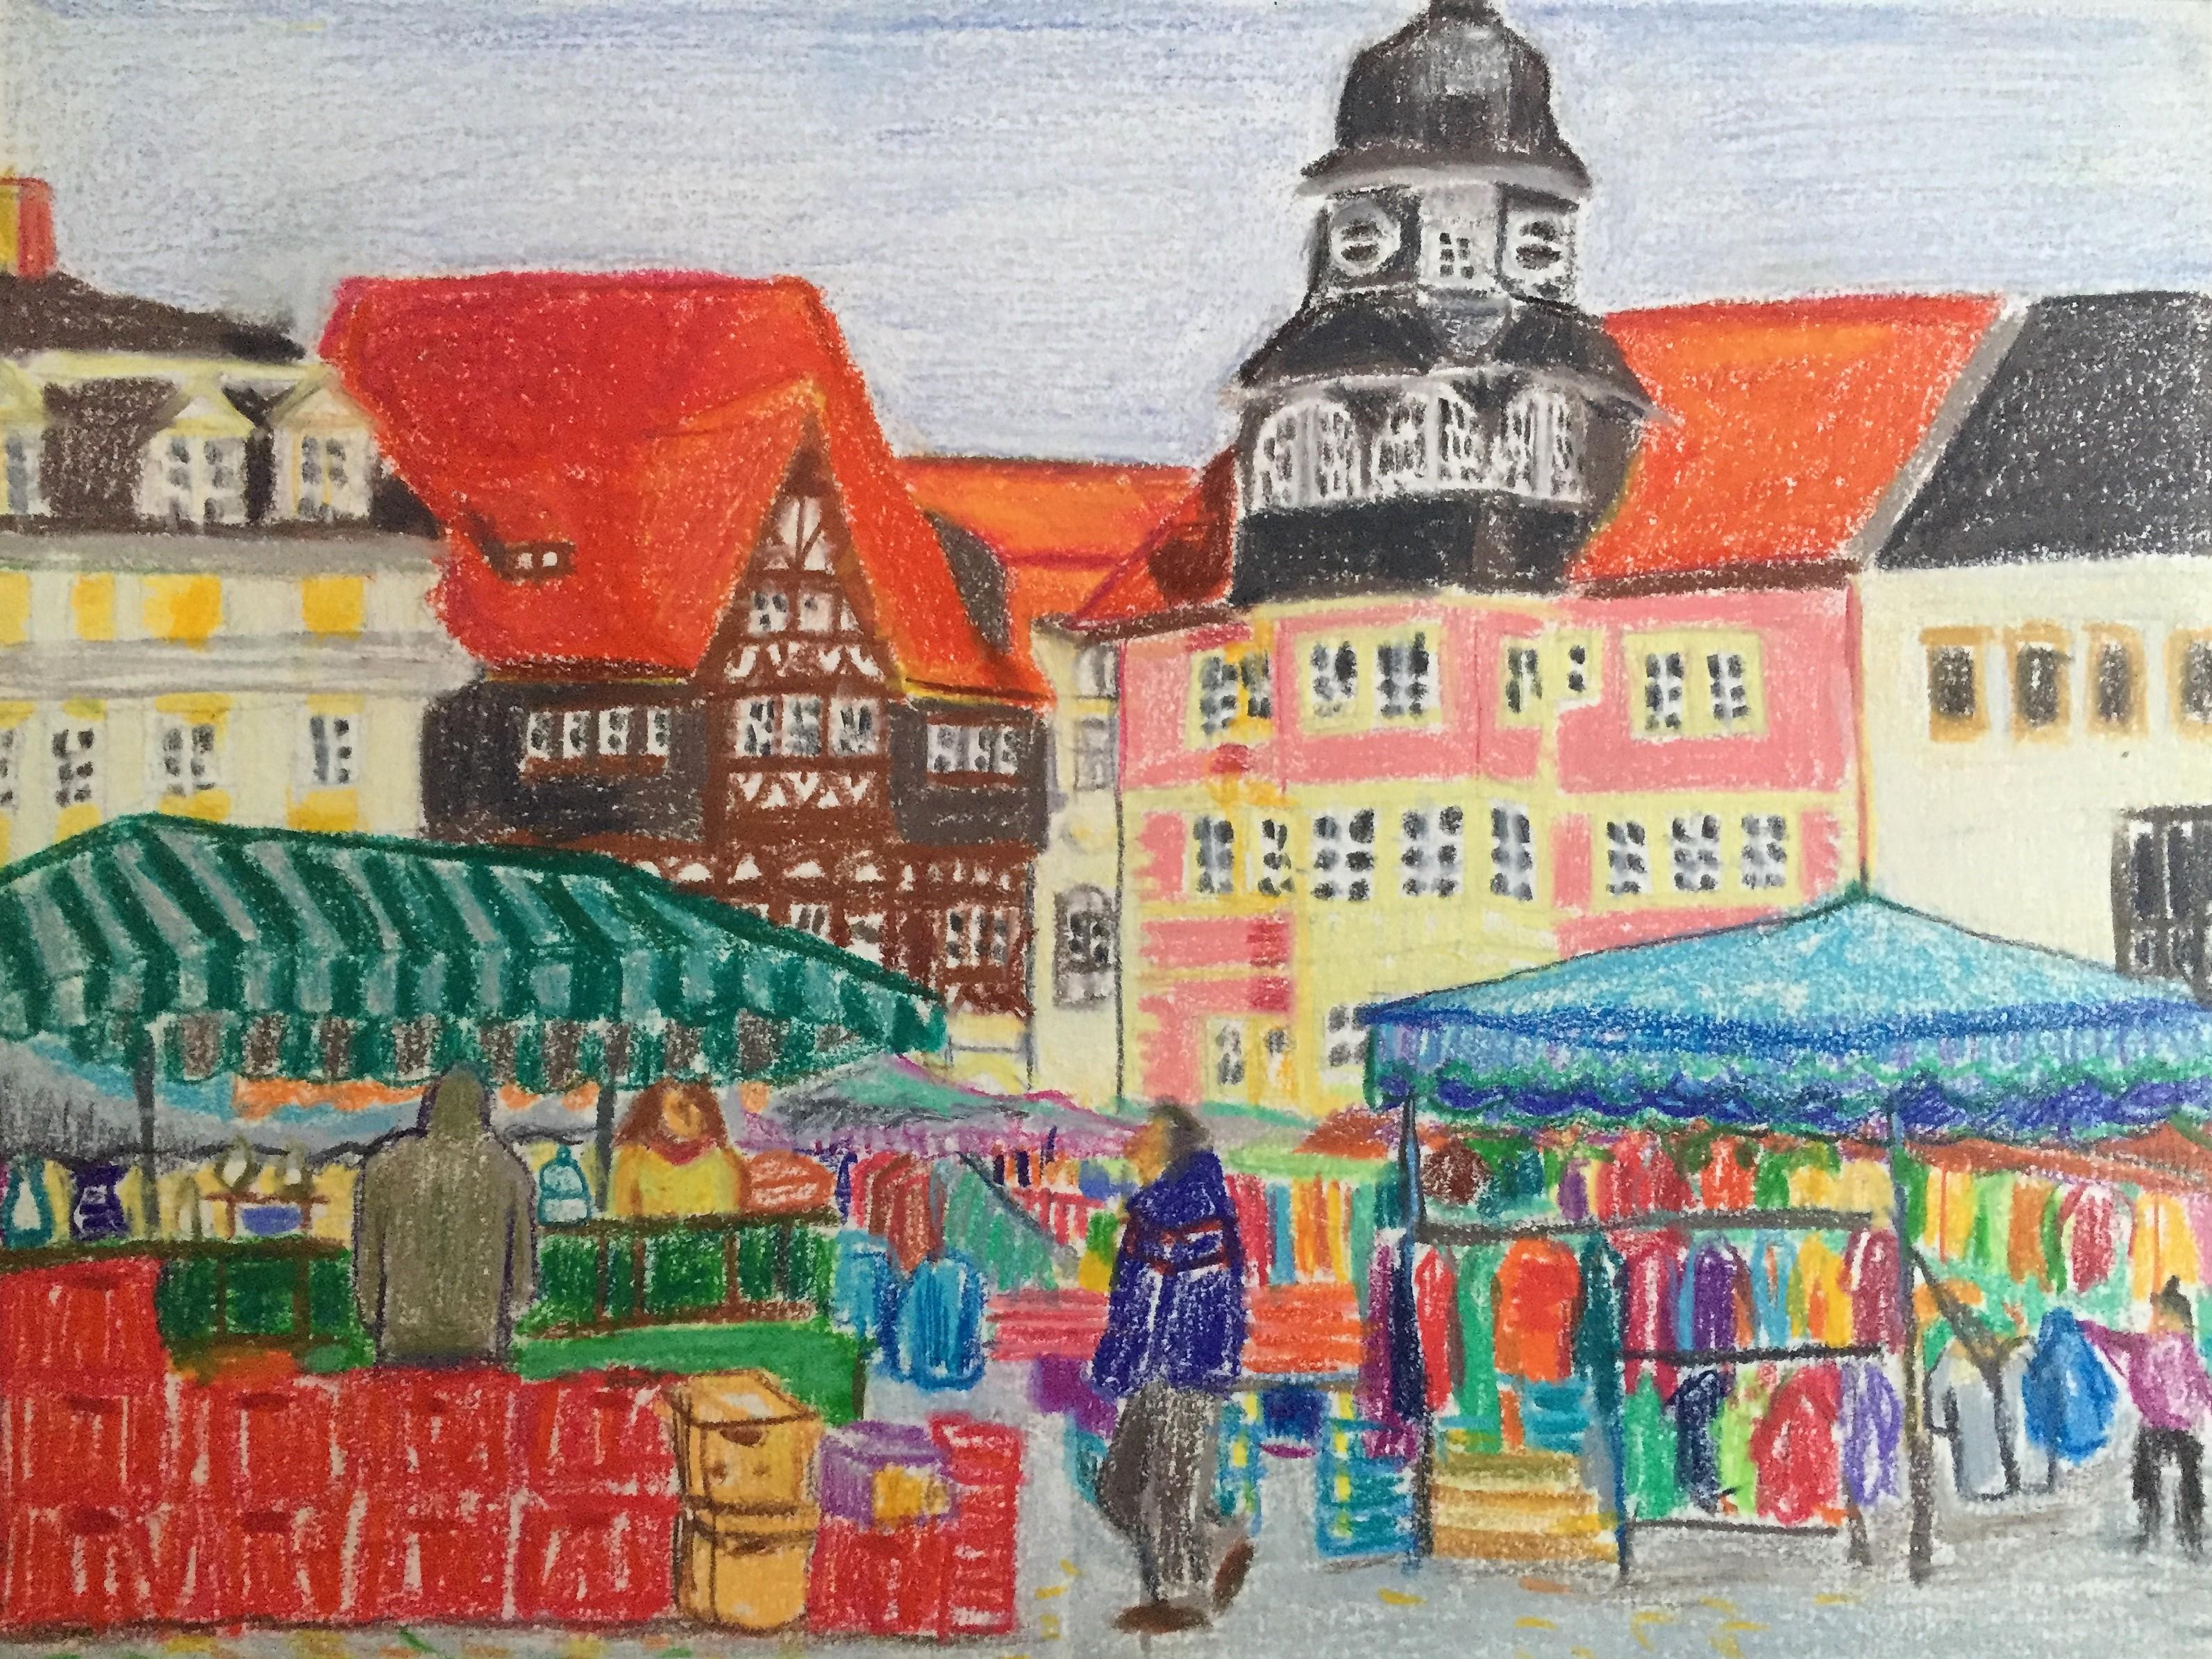 Eisenacher Marktplatz 1997